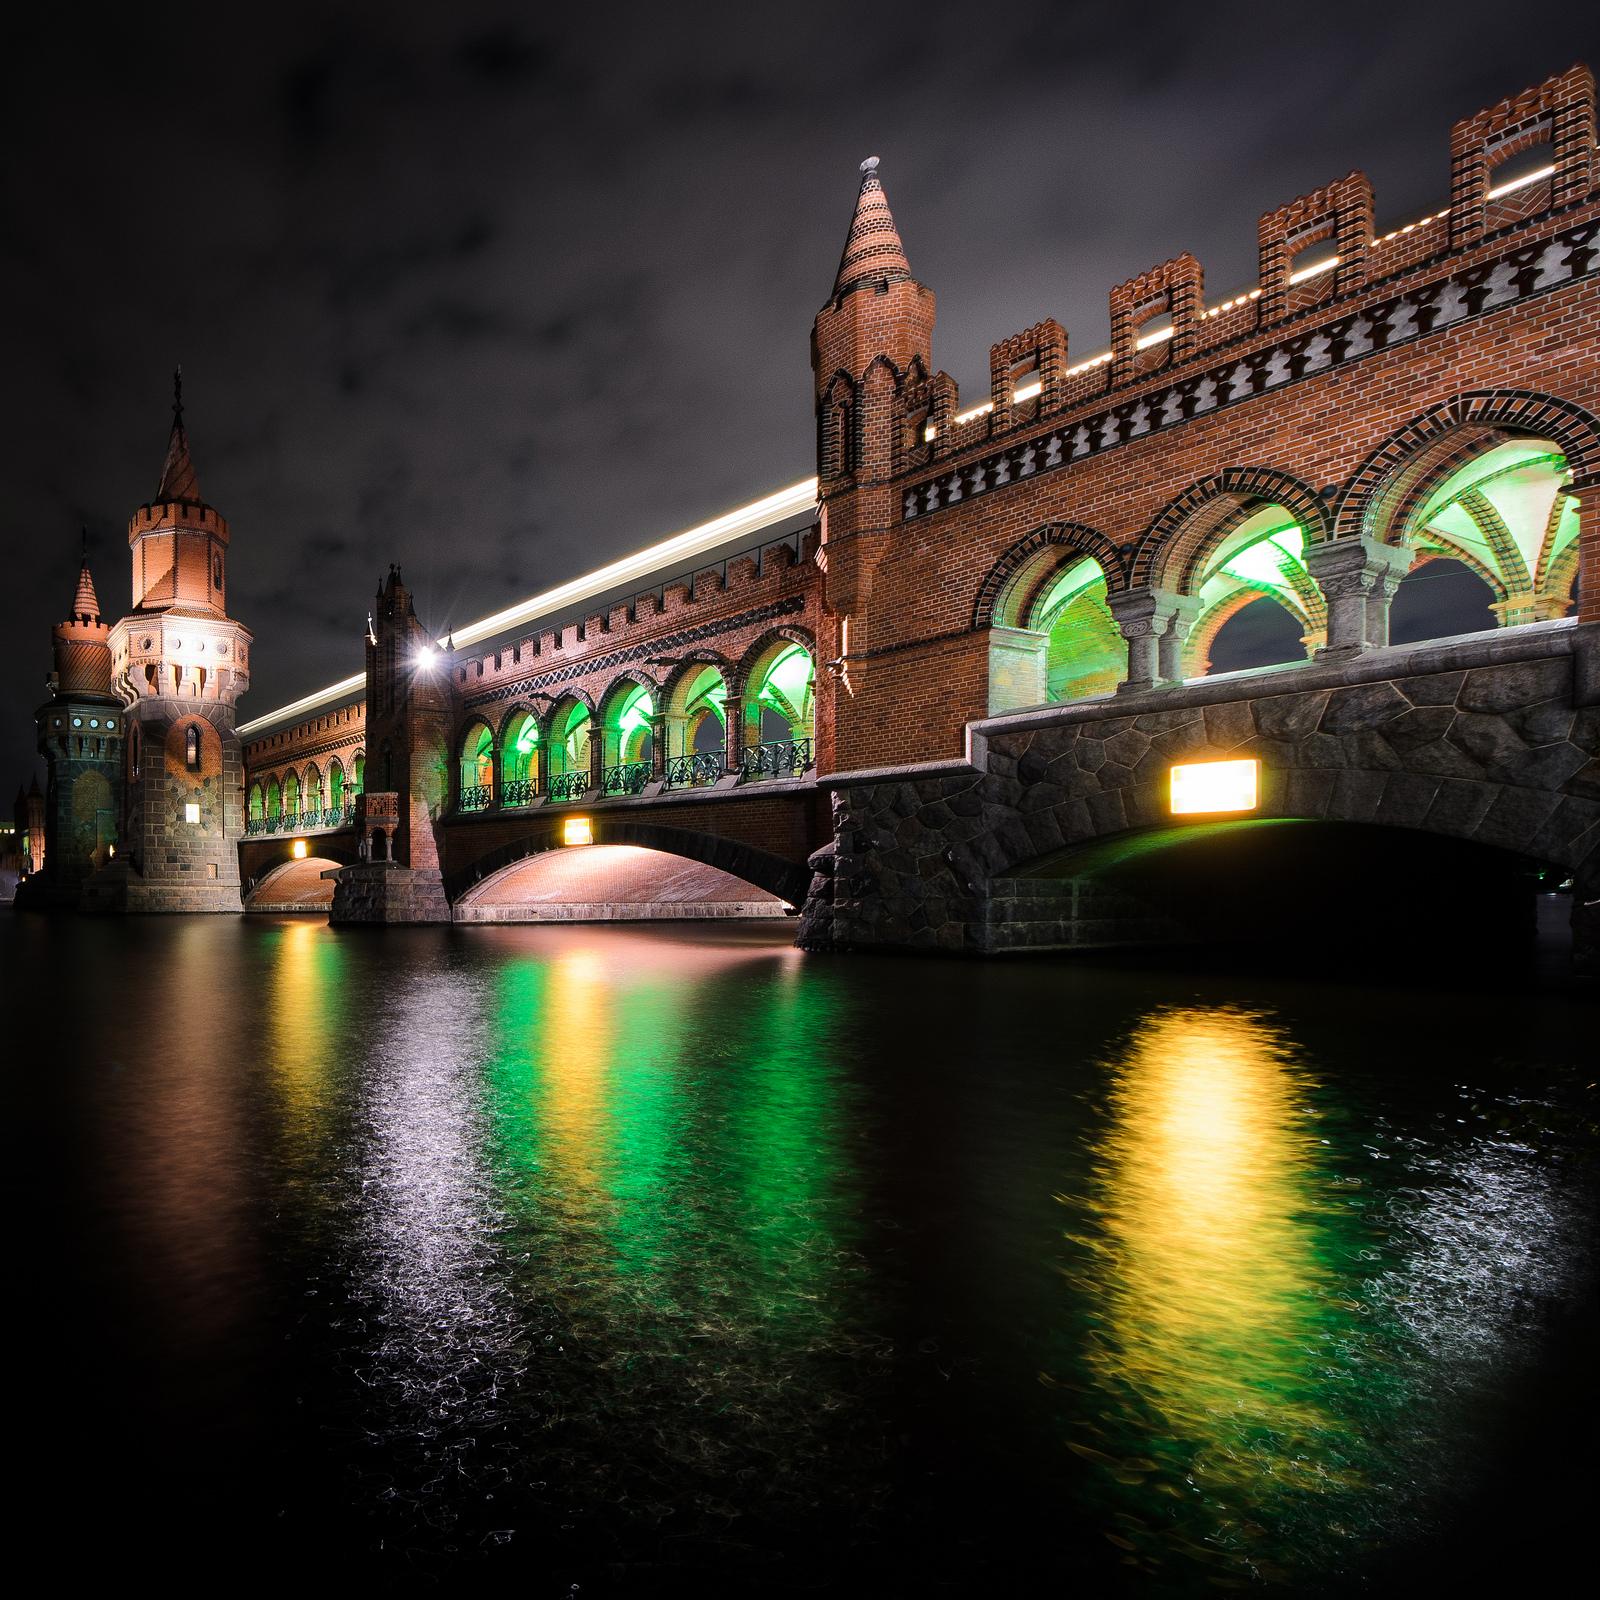 Oberbaumbrücke - Festival of Lights 2012